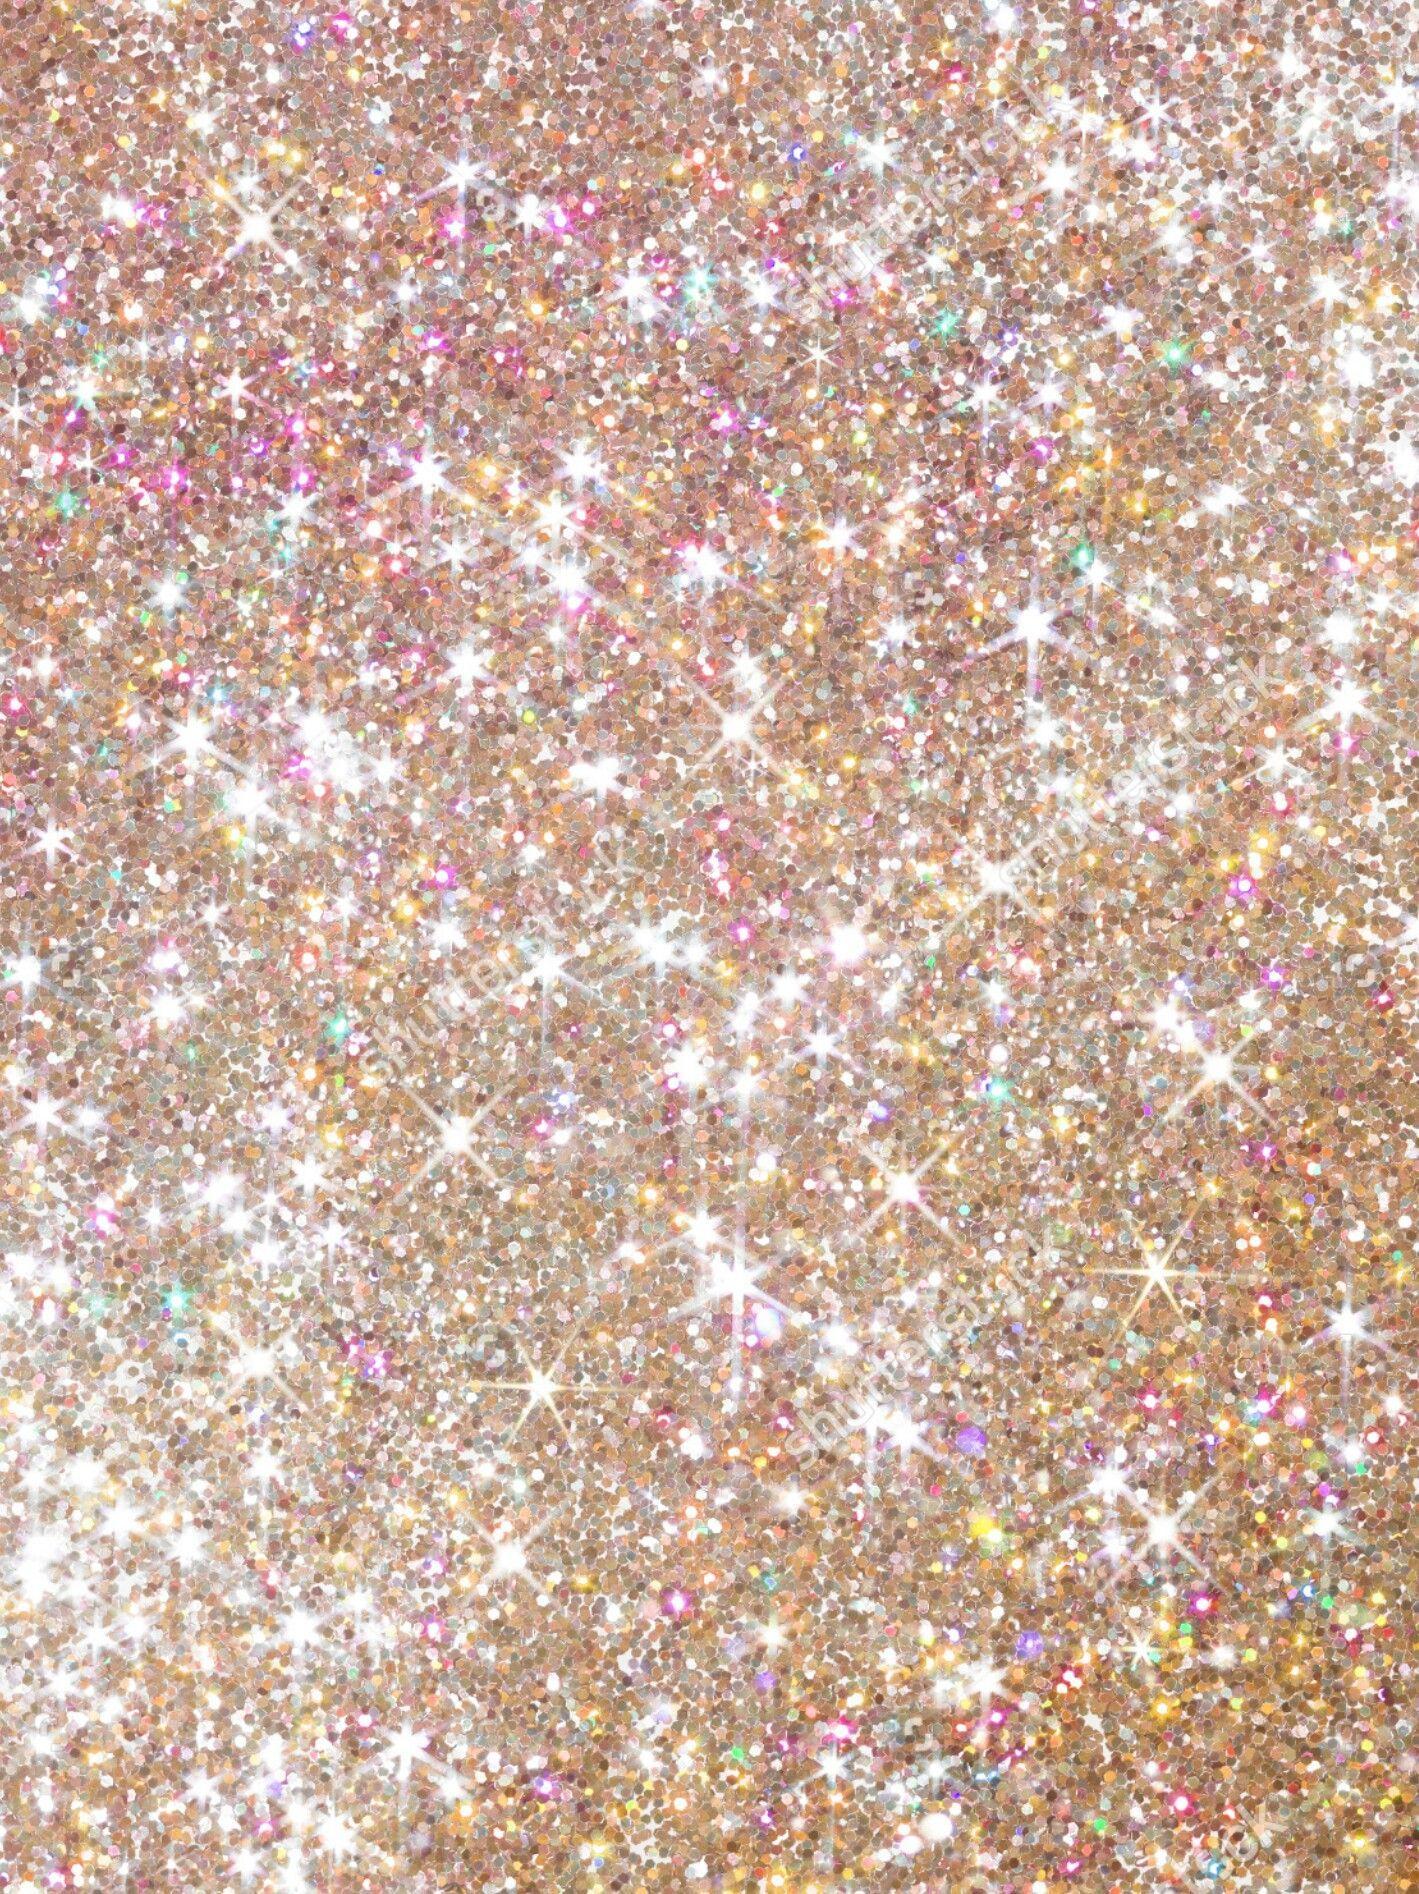 Glitter Wallpaper Sparkle Wallpaper Sparkles Background Gold Sparkle Background Iphone rose gold glitter wallpaper hd